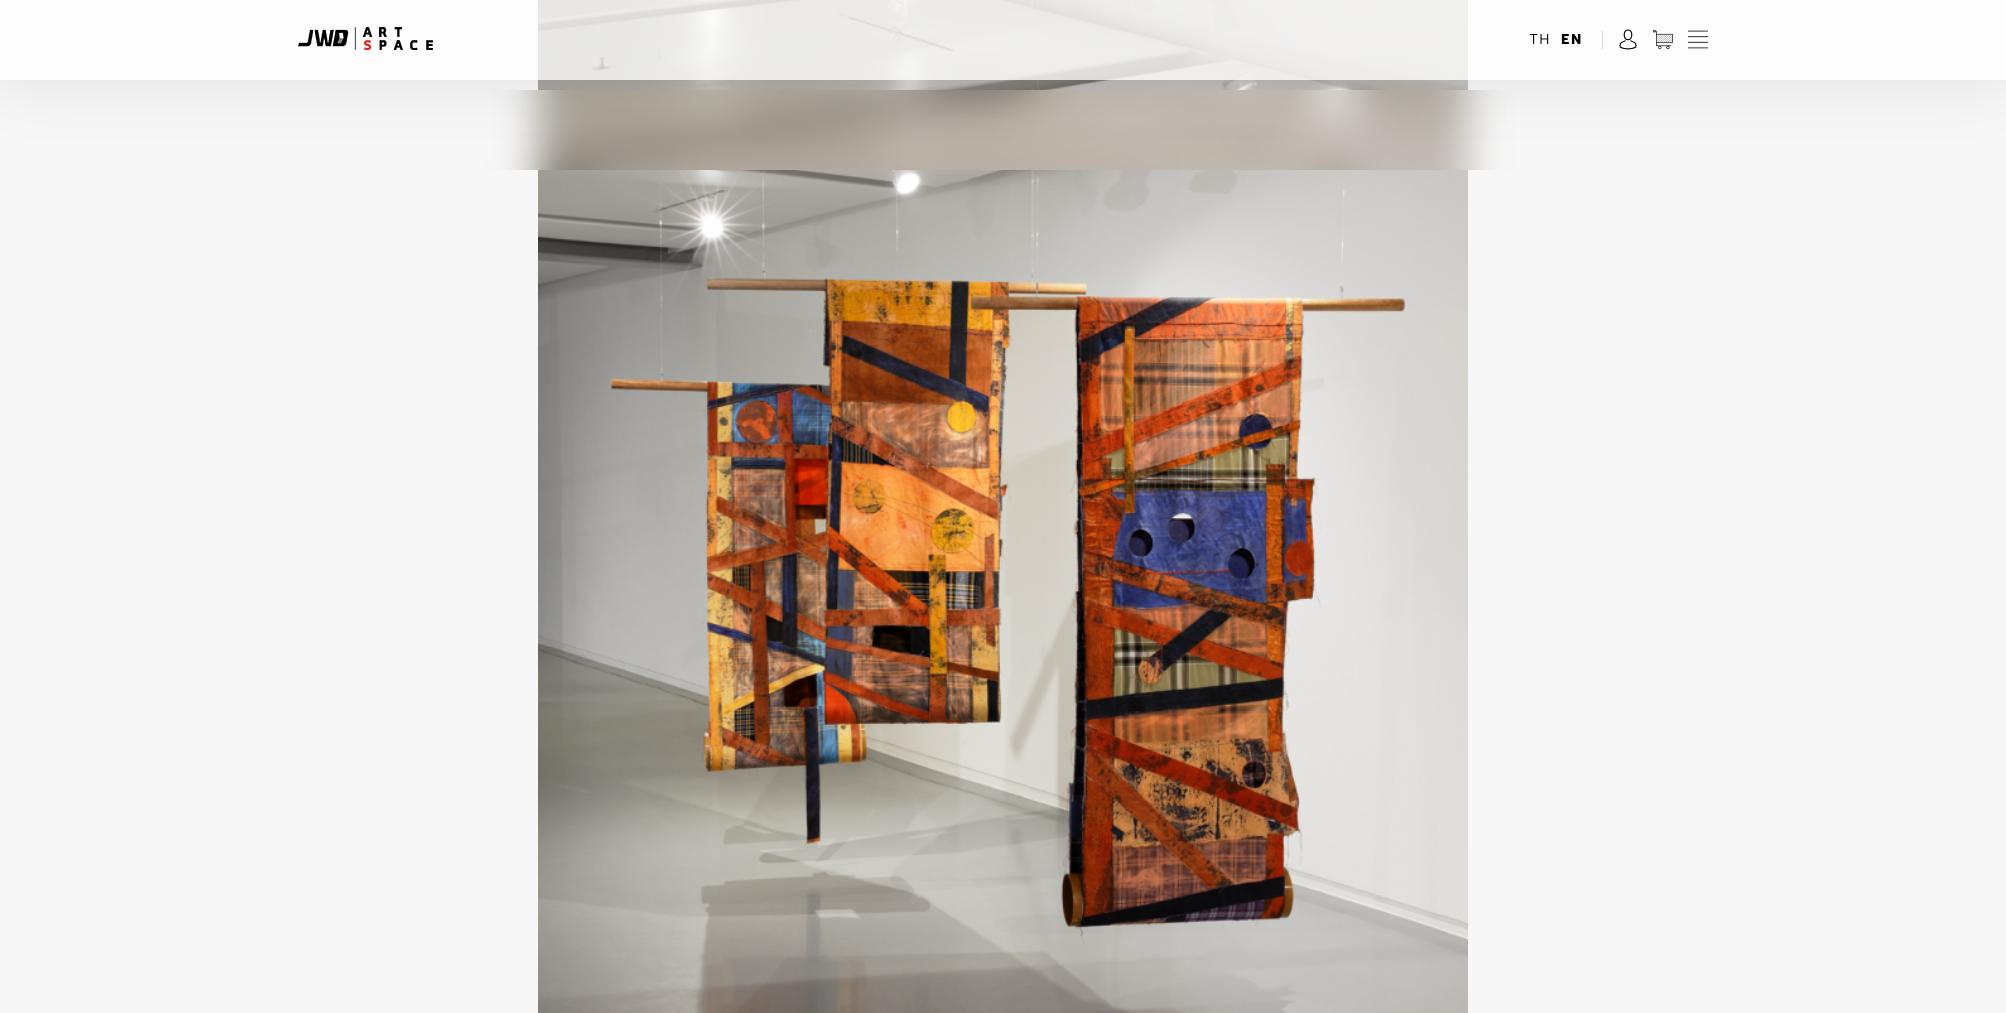 JWD Art Space – A LIFE BEYOND BOUNDARIES (THE GEOGRAPHY OF BELONGING): ARTISTS IN FOCUS SERIES